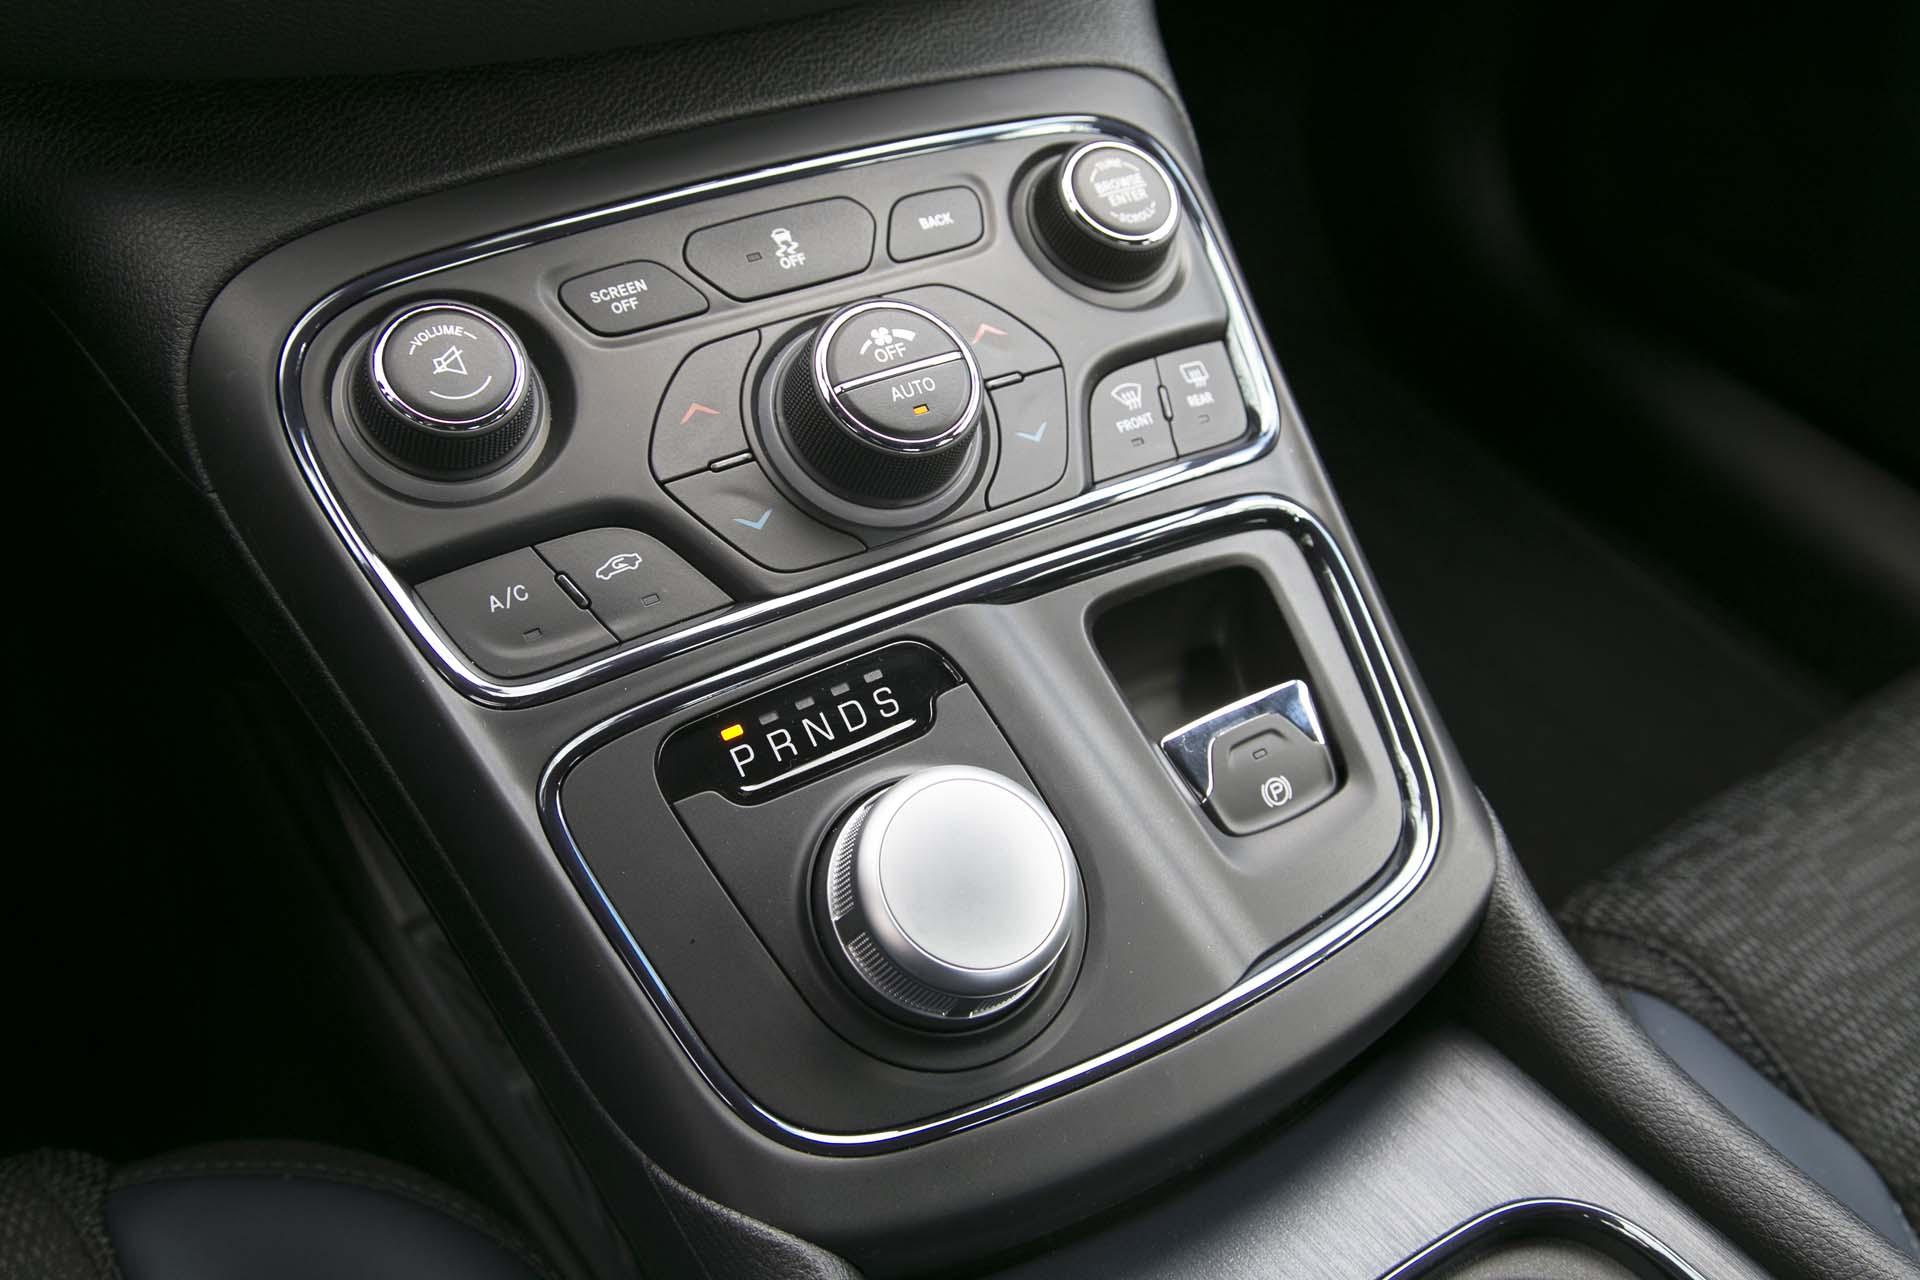 HVAC controls & gear select dial